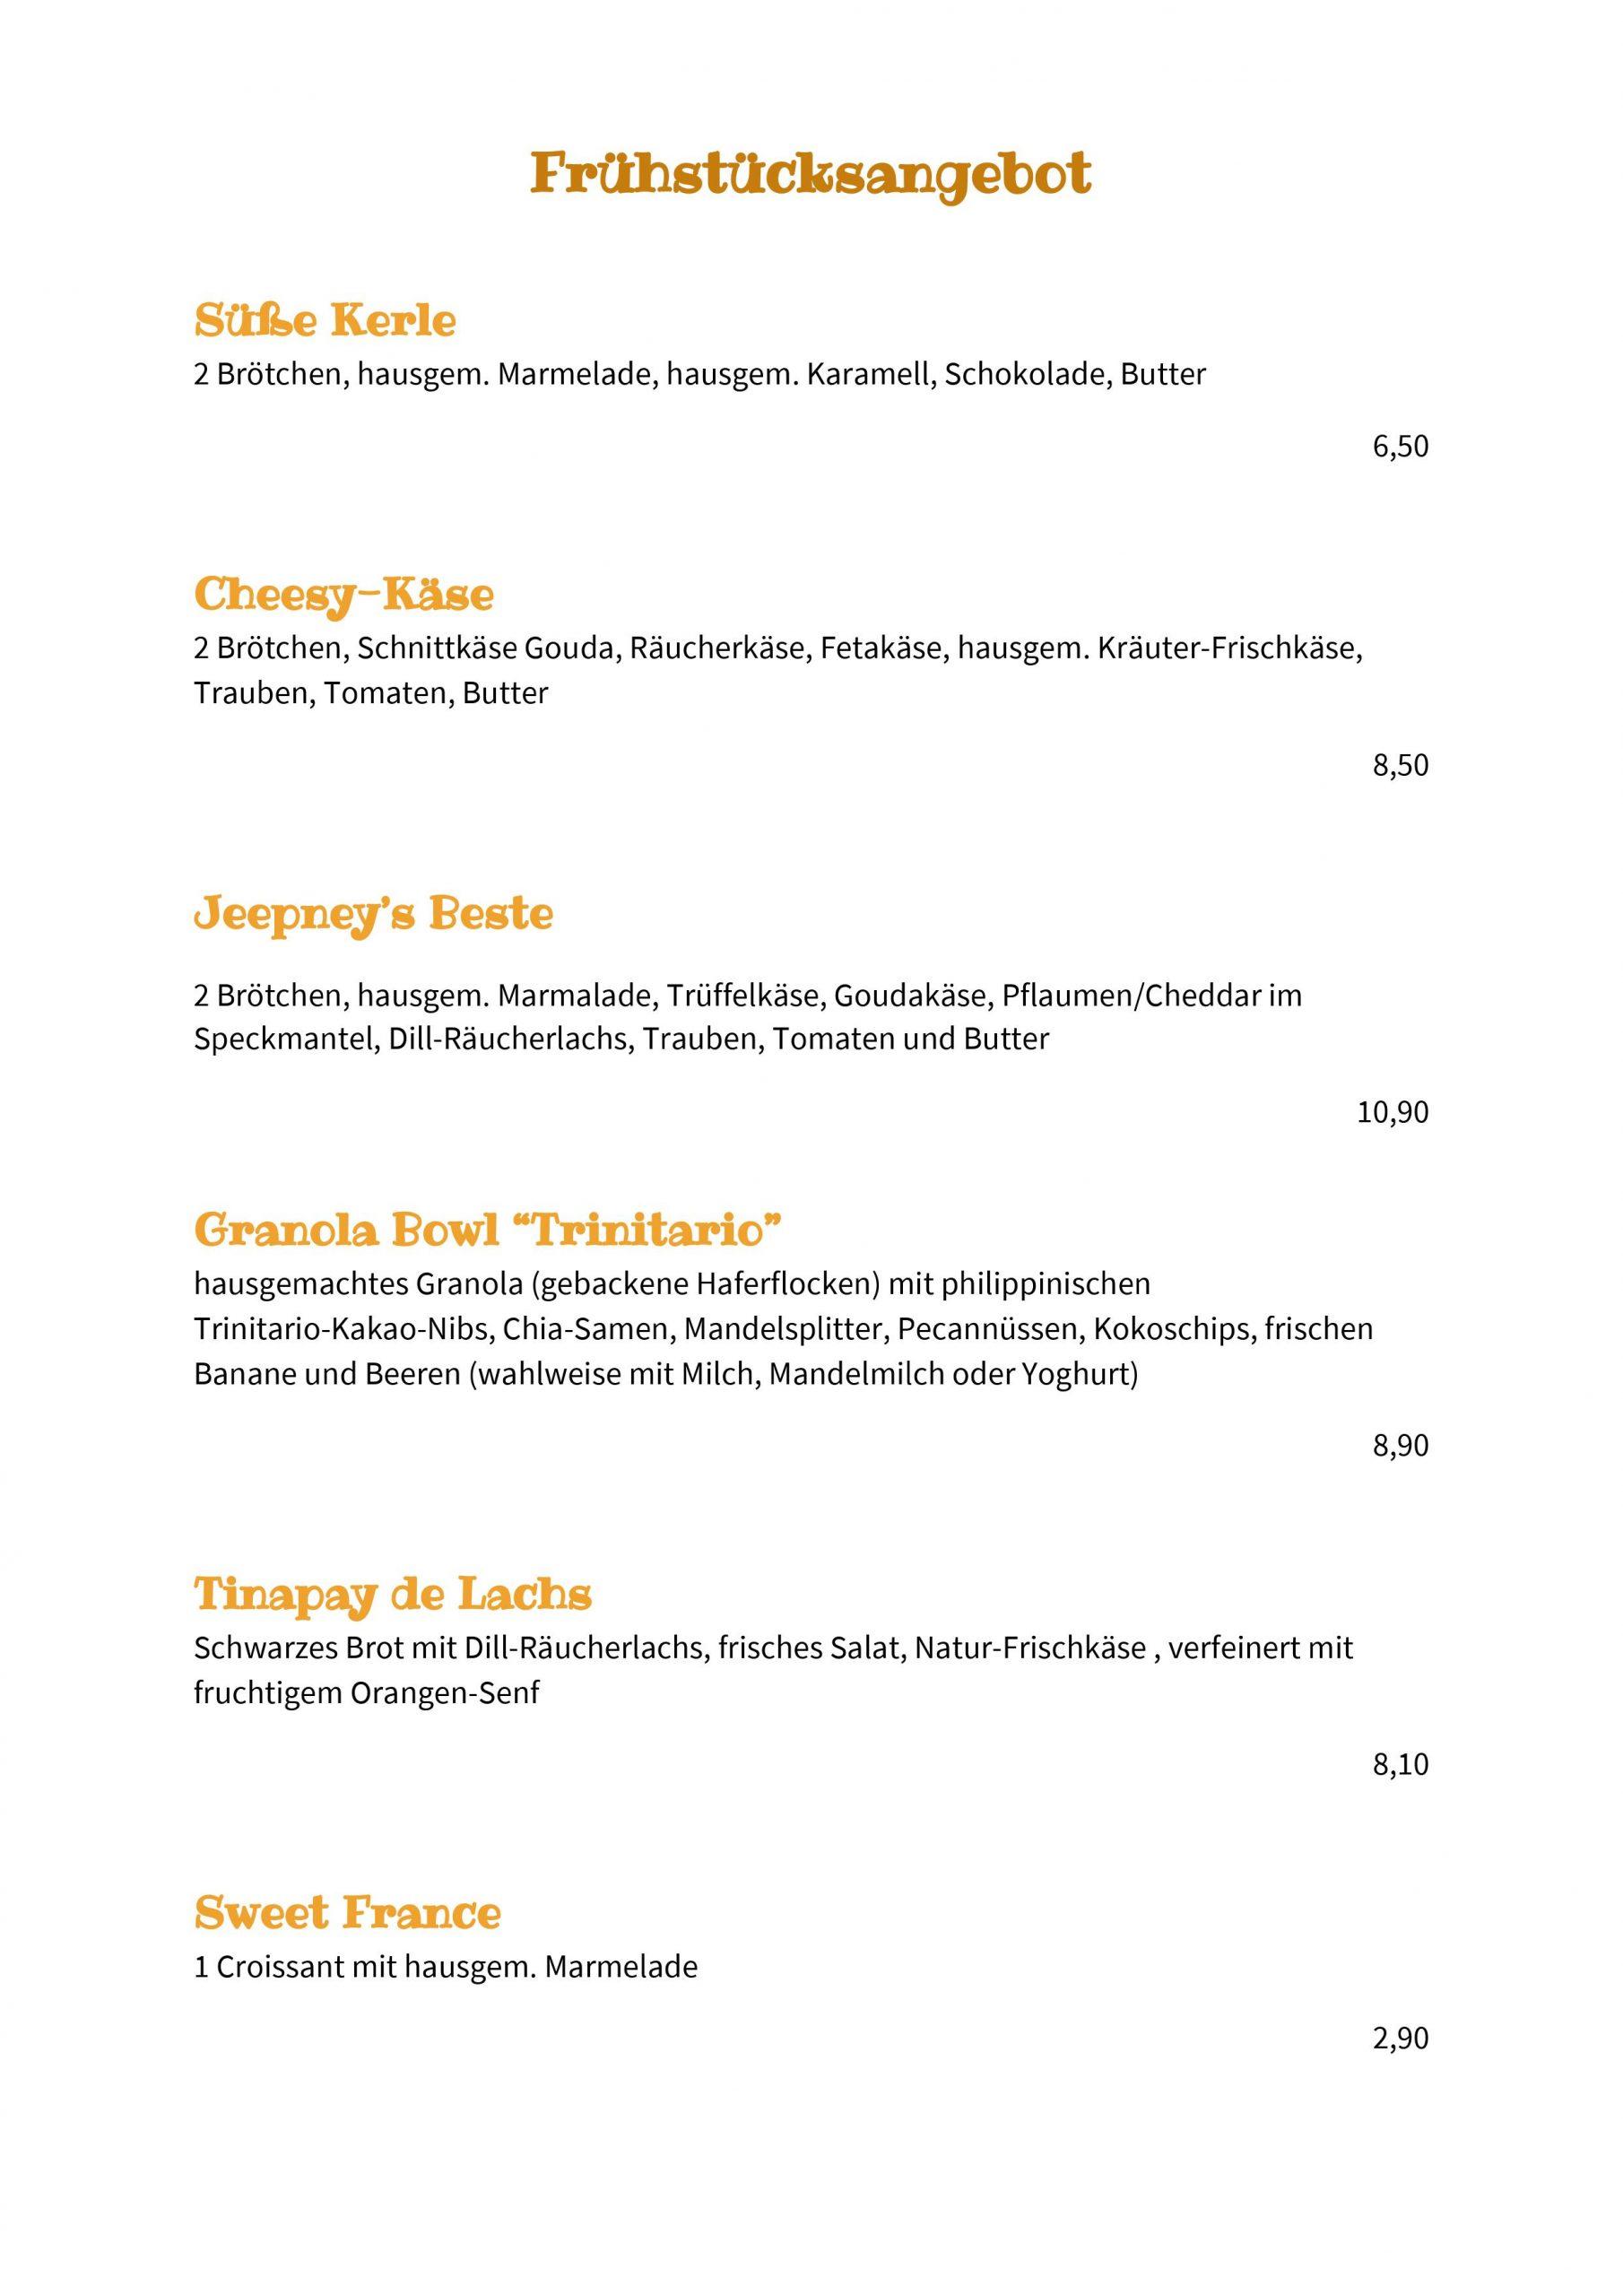 Käseplatte, Granola, Brötchen, Croissants